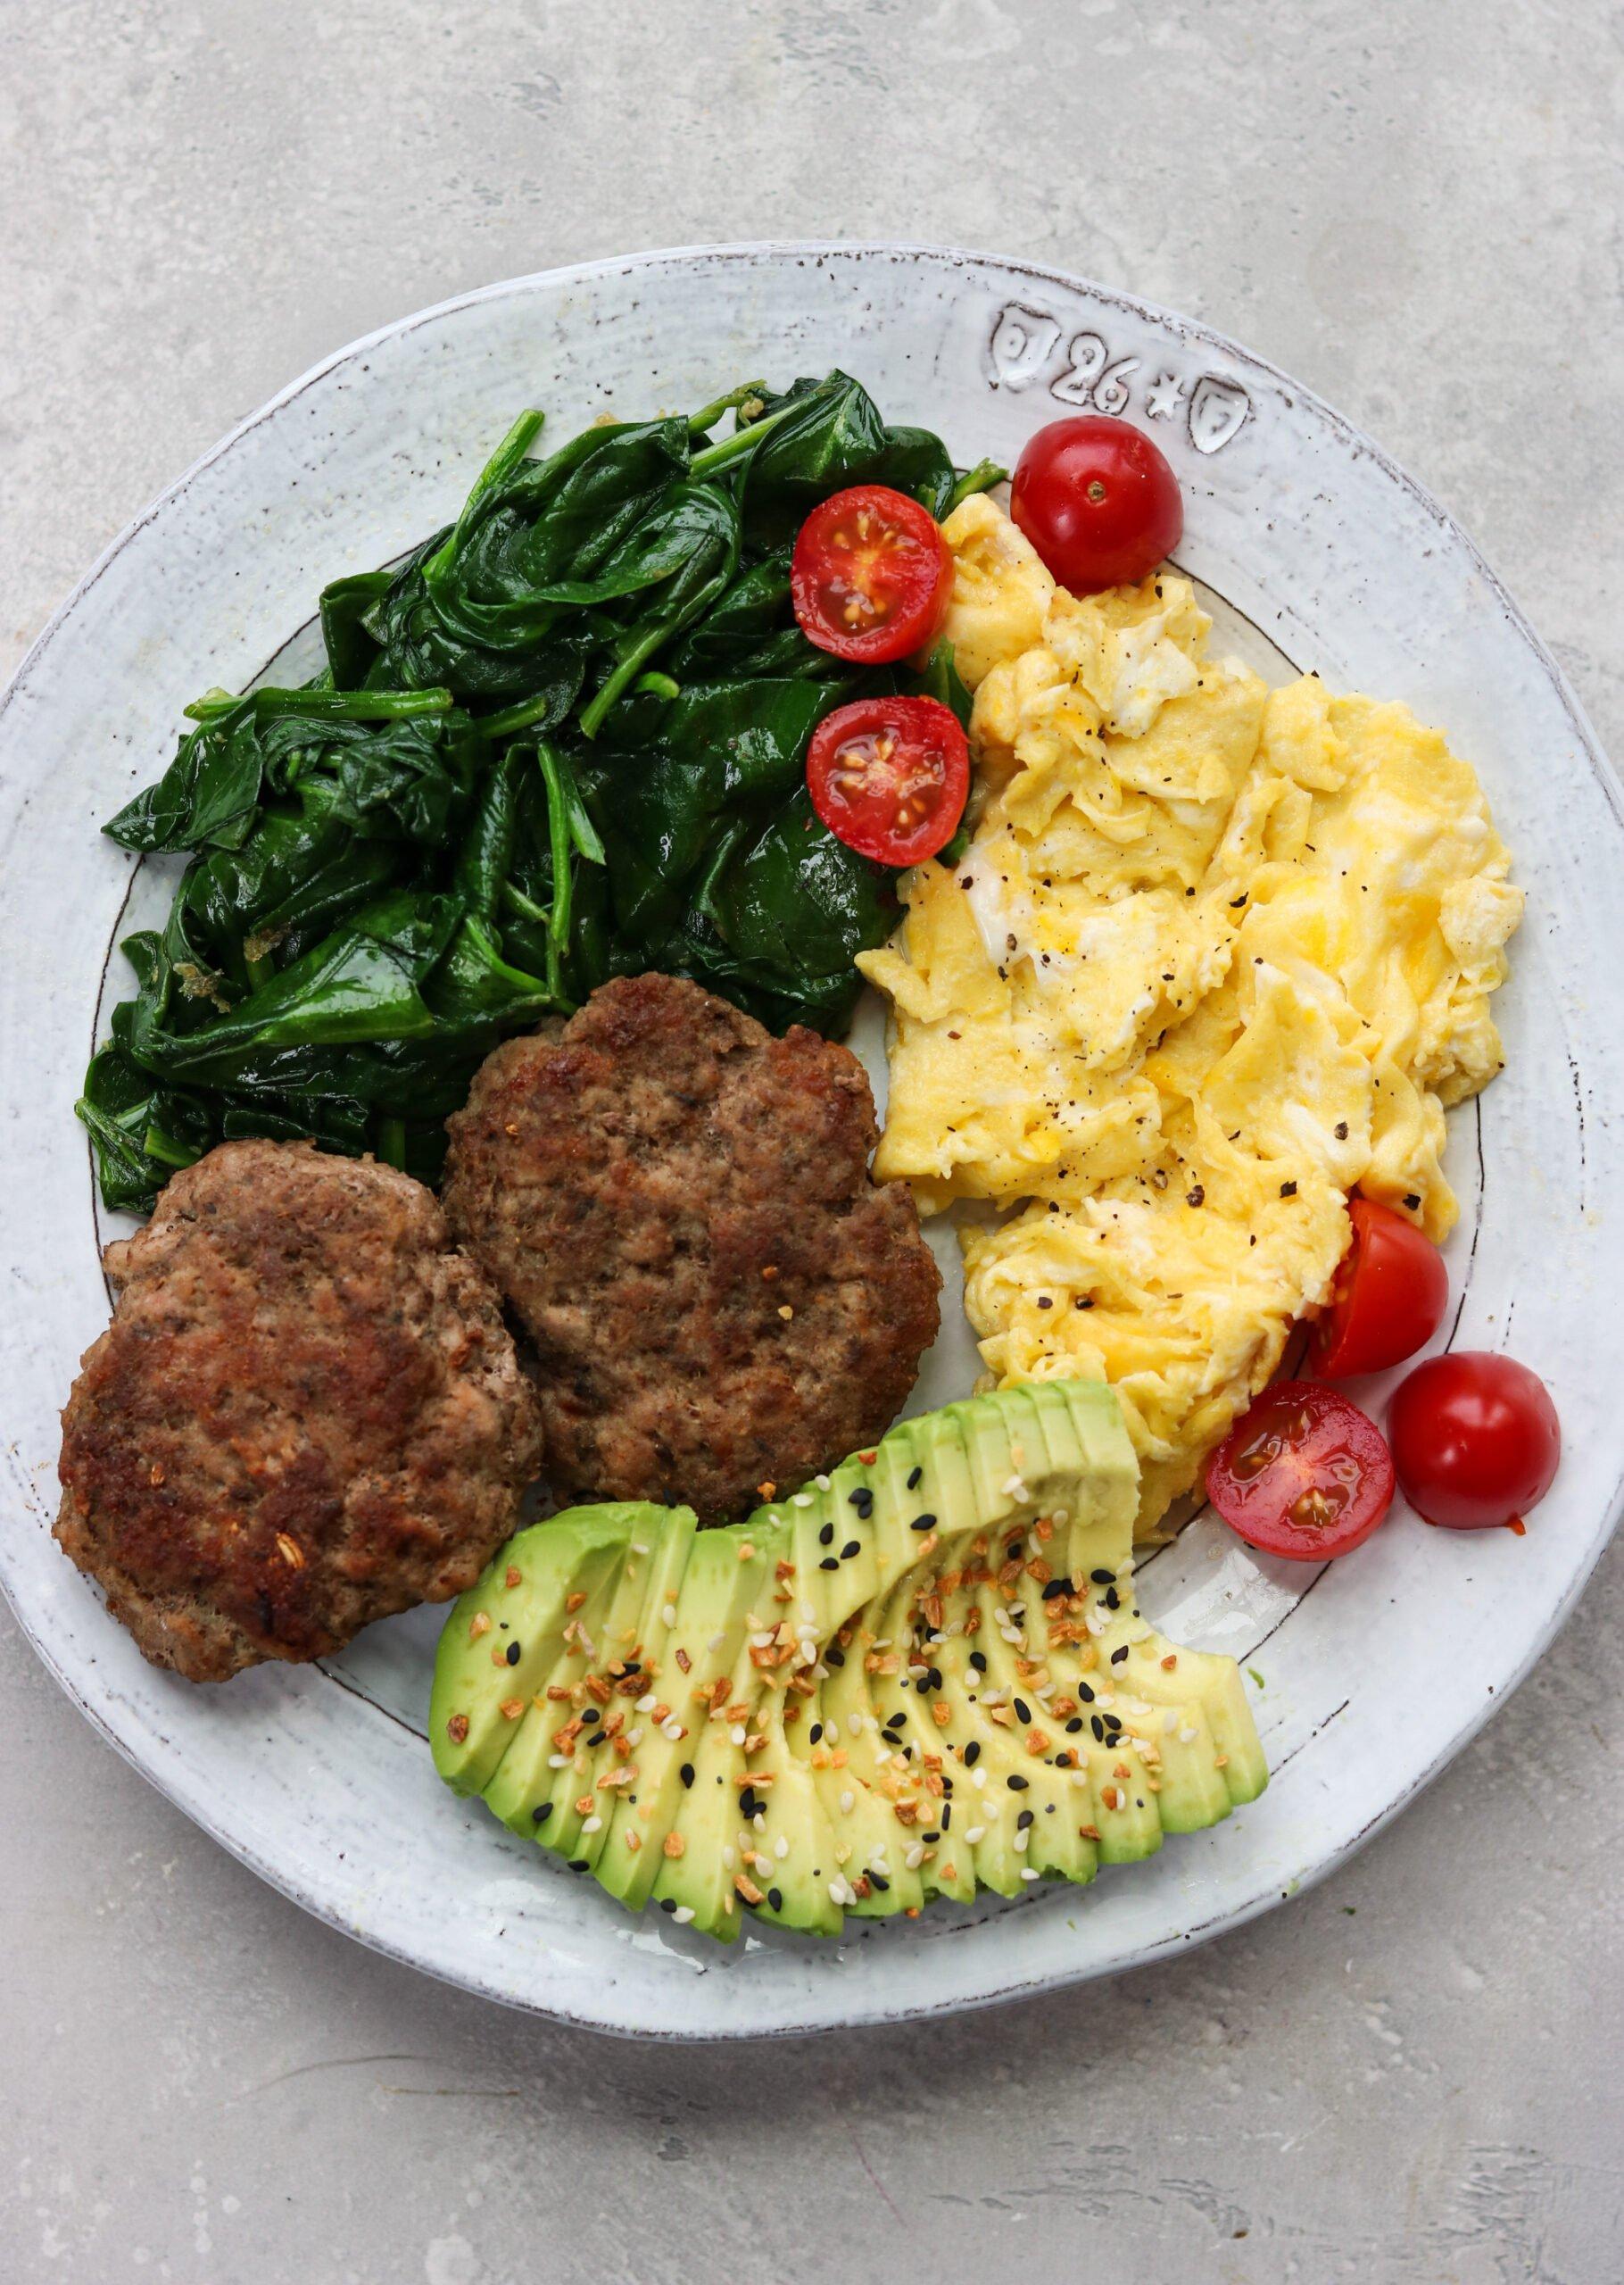 homemade sausage patties and eggs